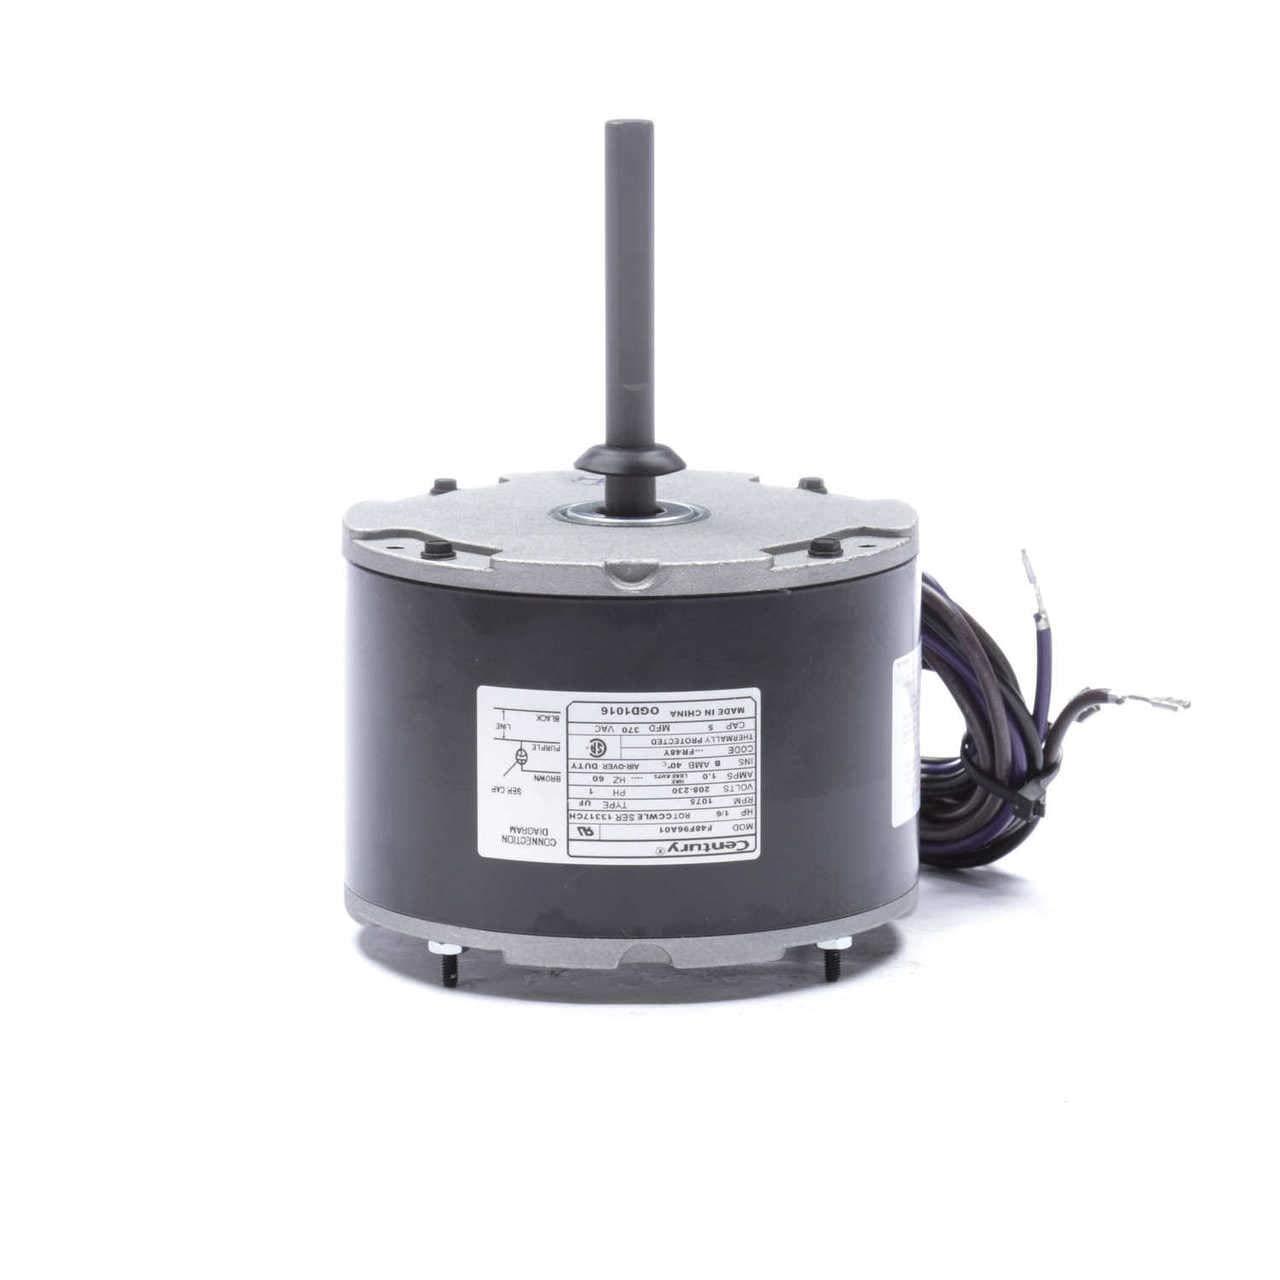 Goodman/Janitrol Condenser Motor 1/6 hp 1075 RPM 208-230V Century # on